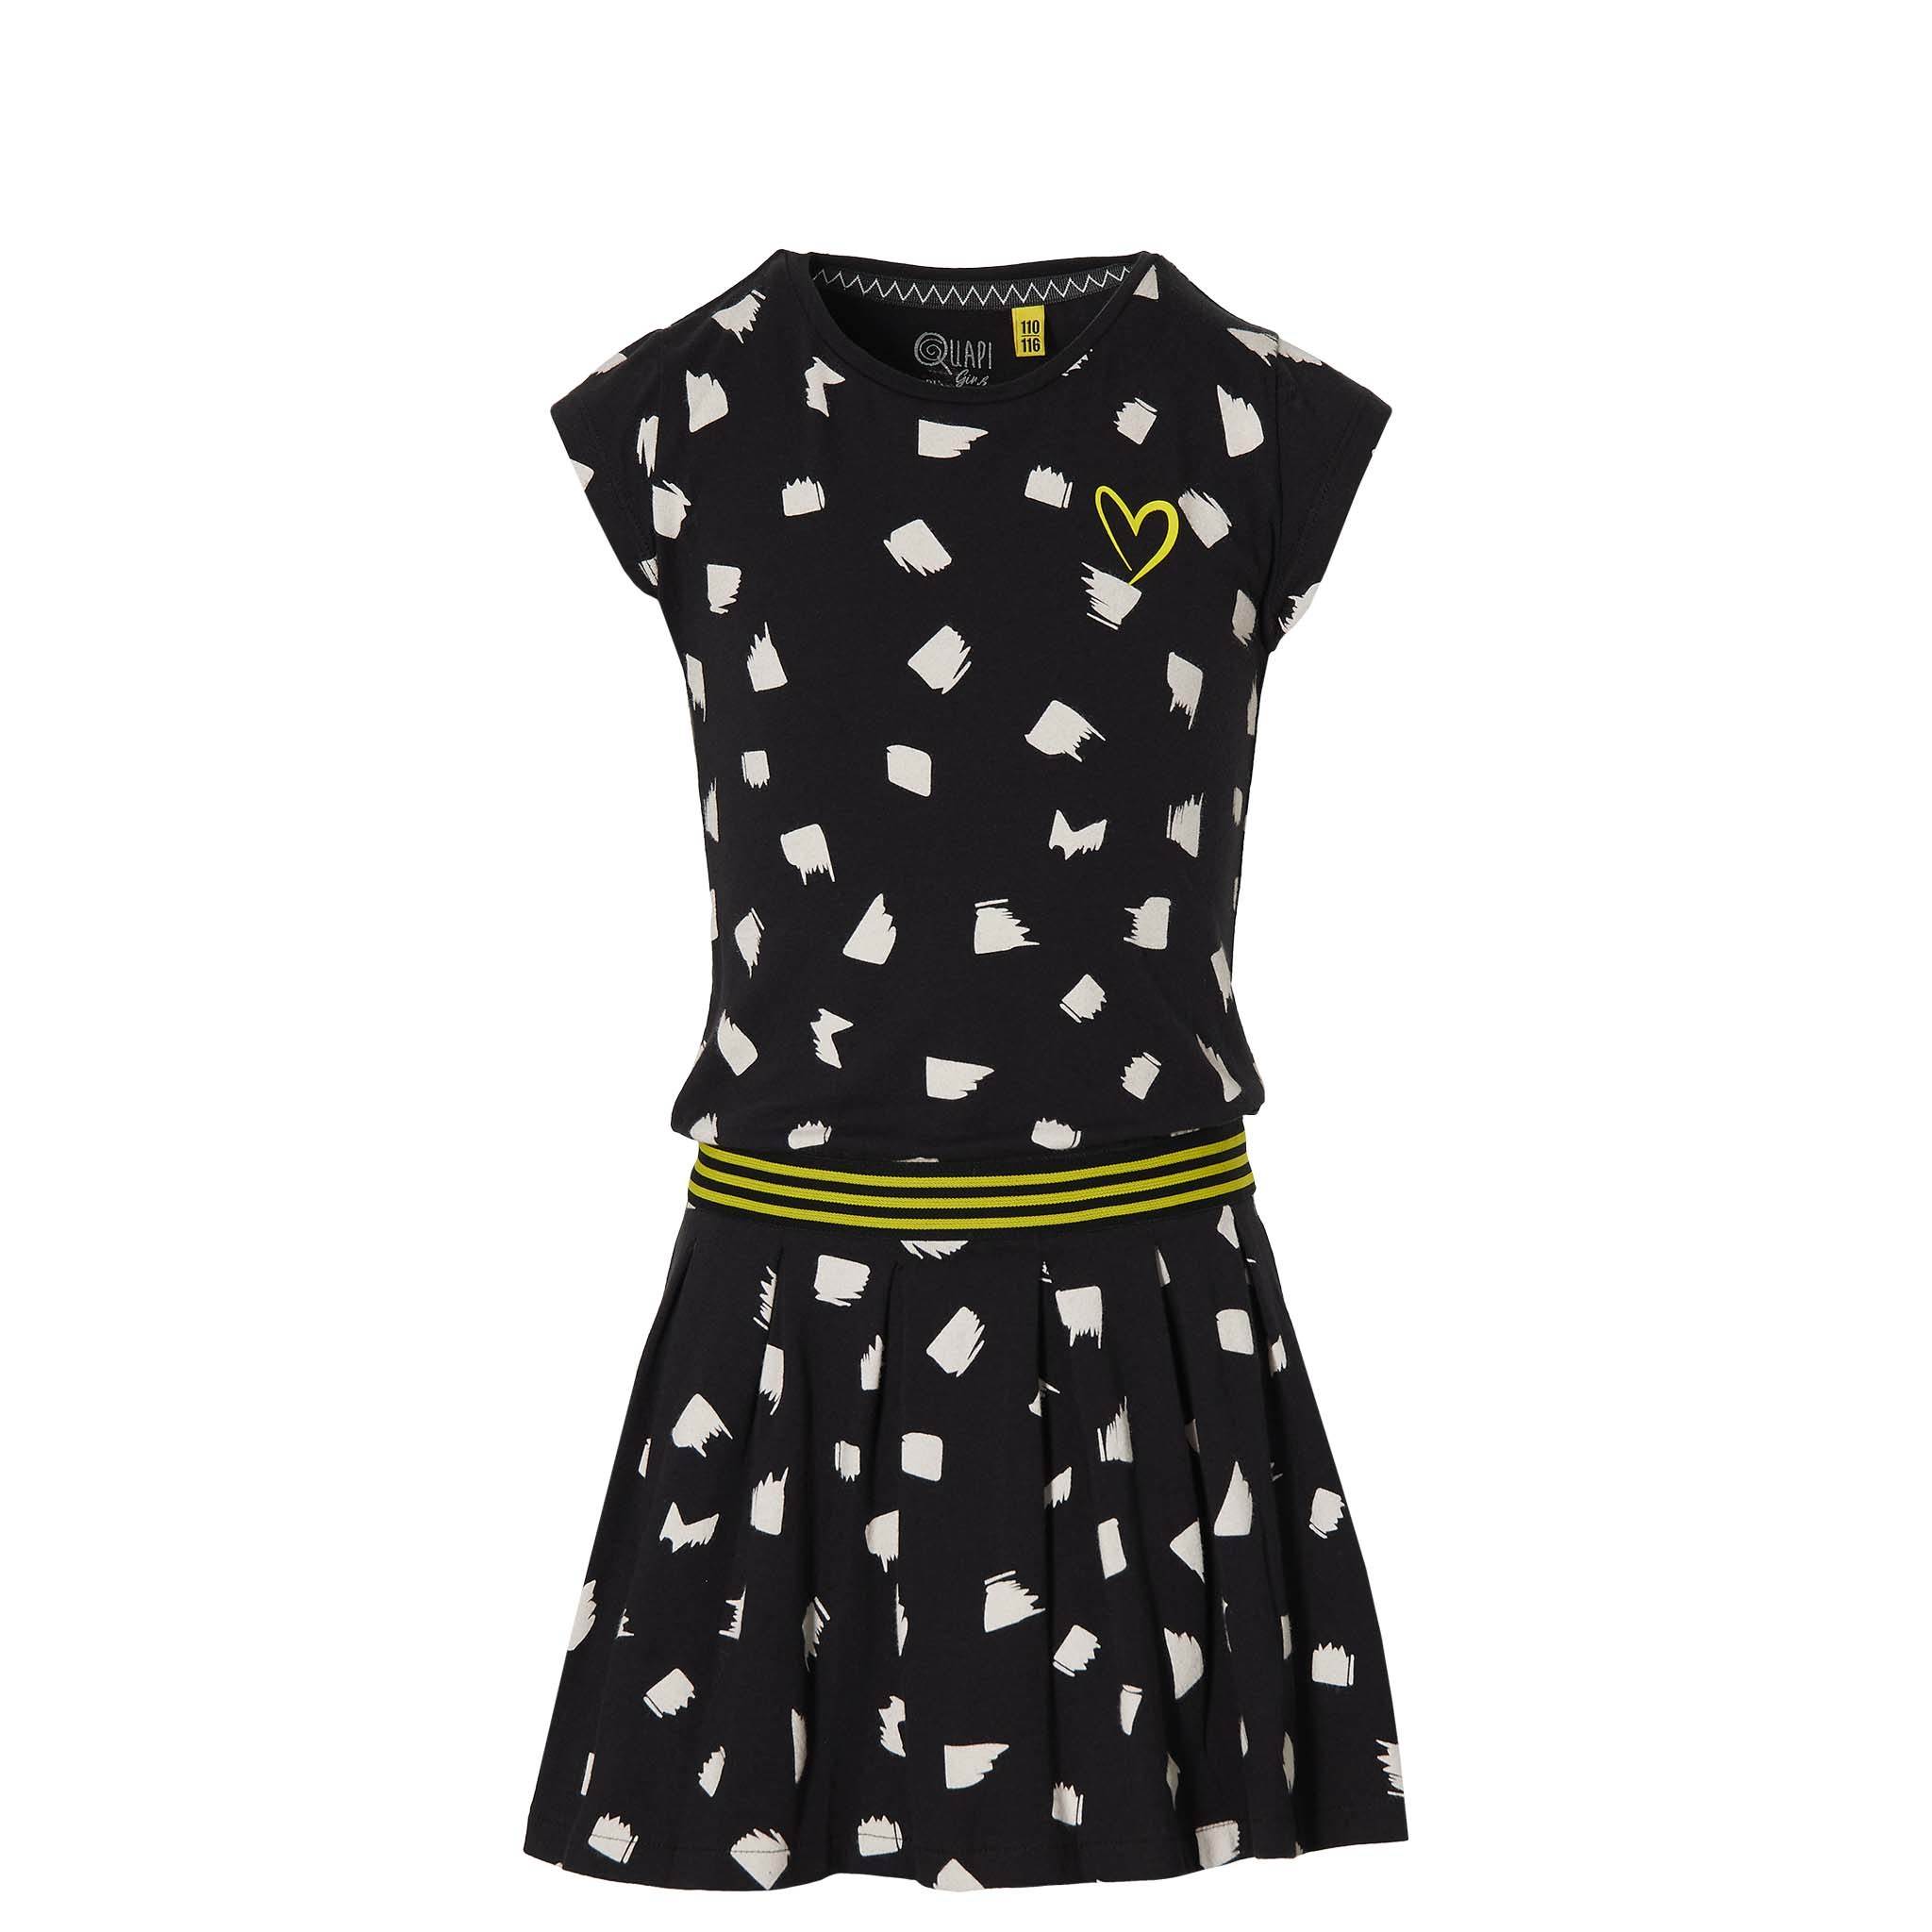 jurk Fabia black dot